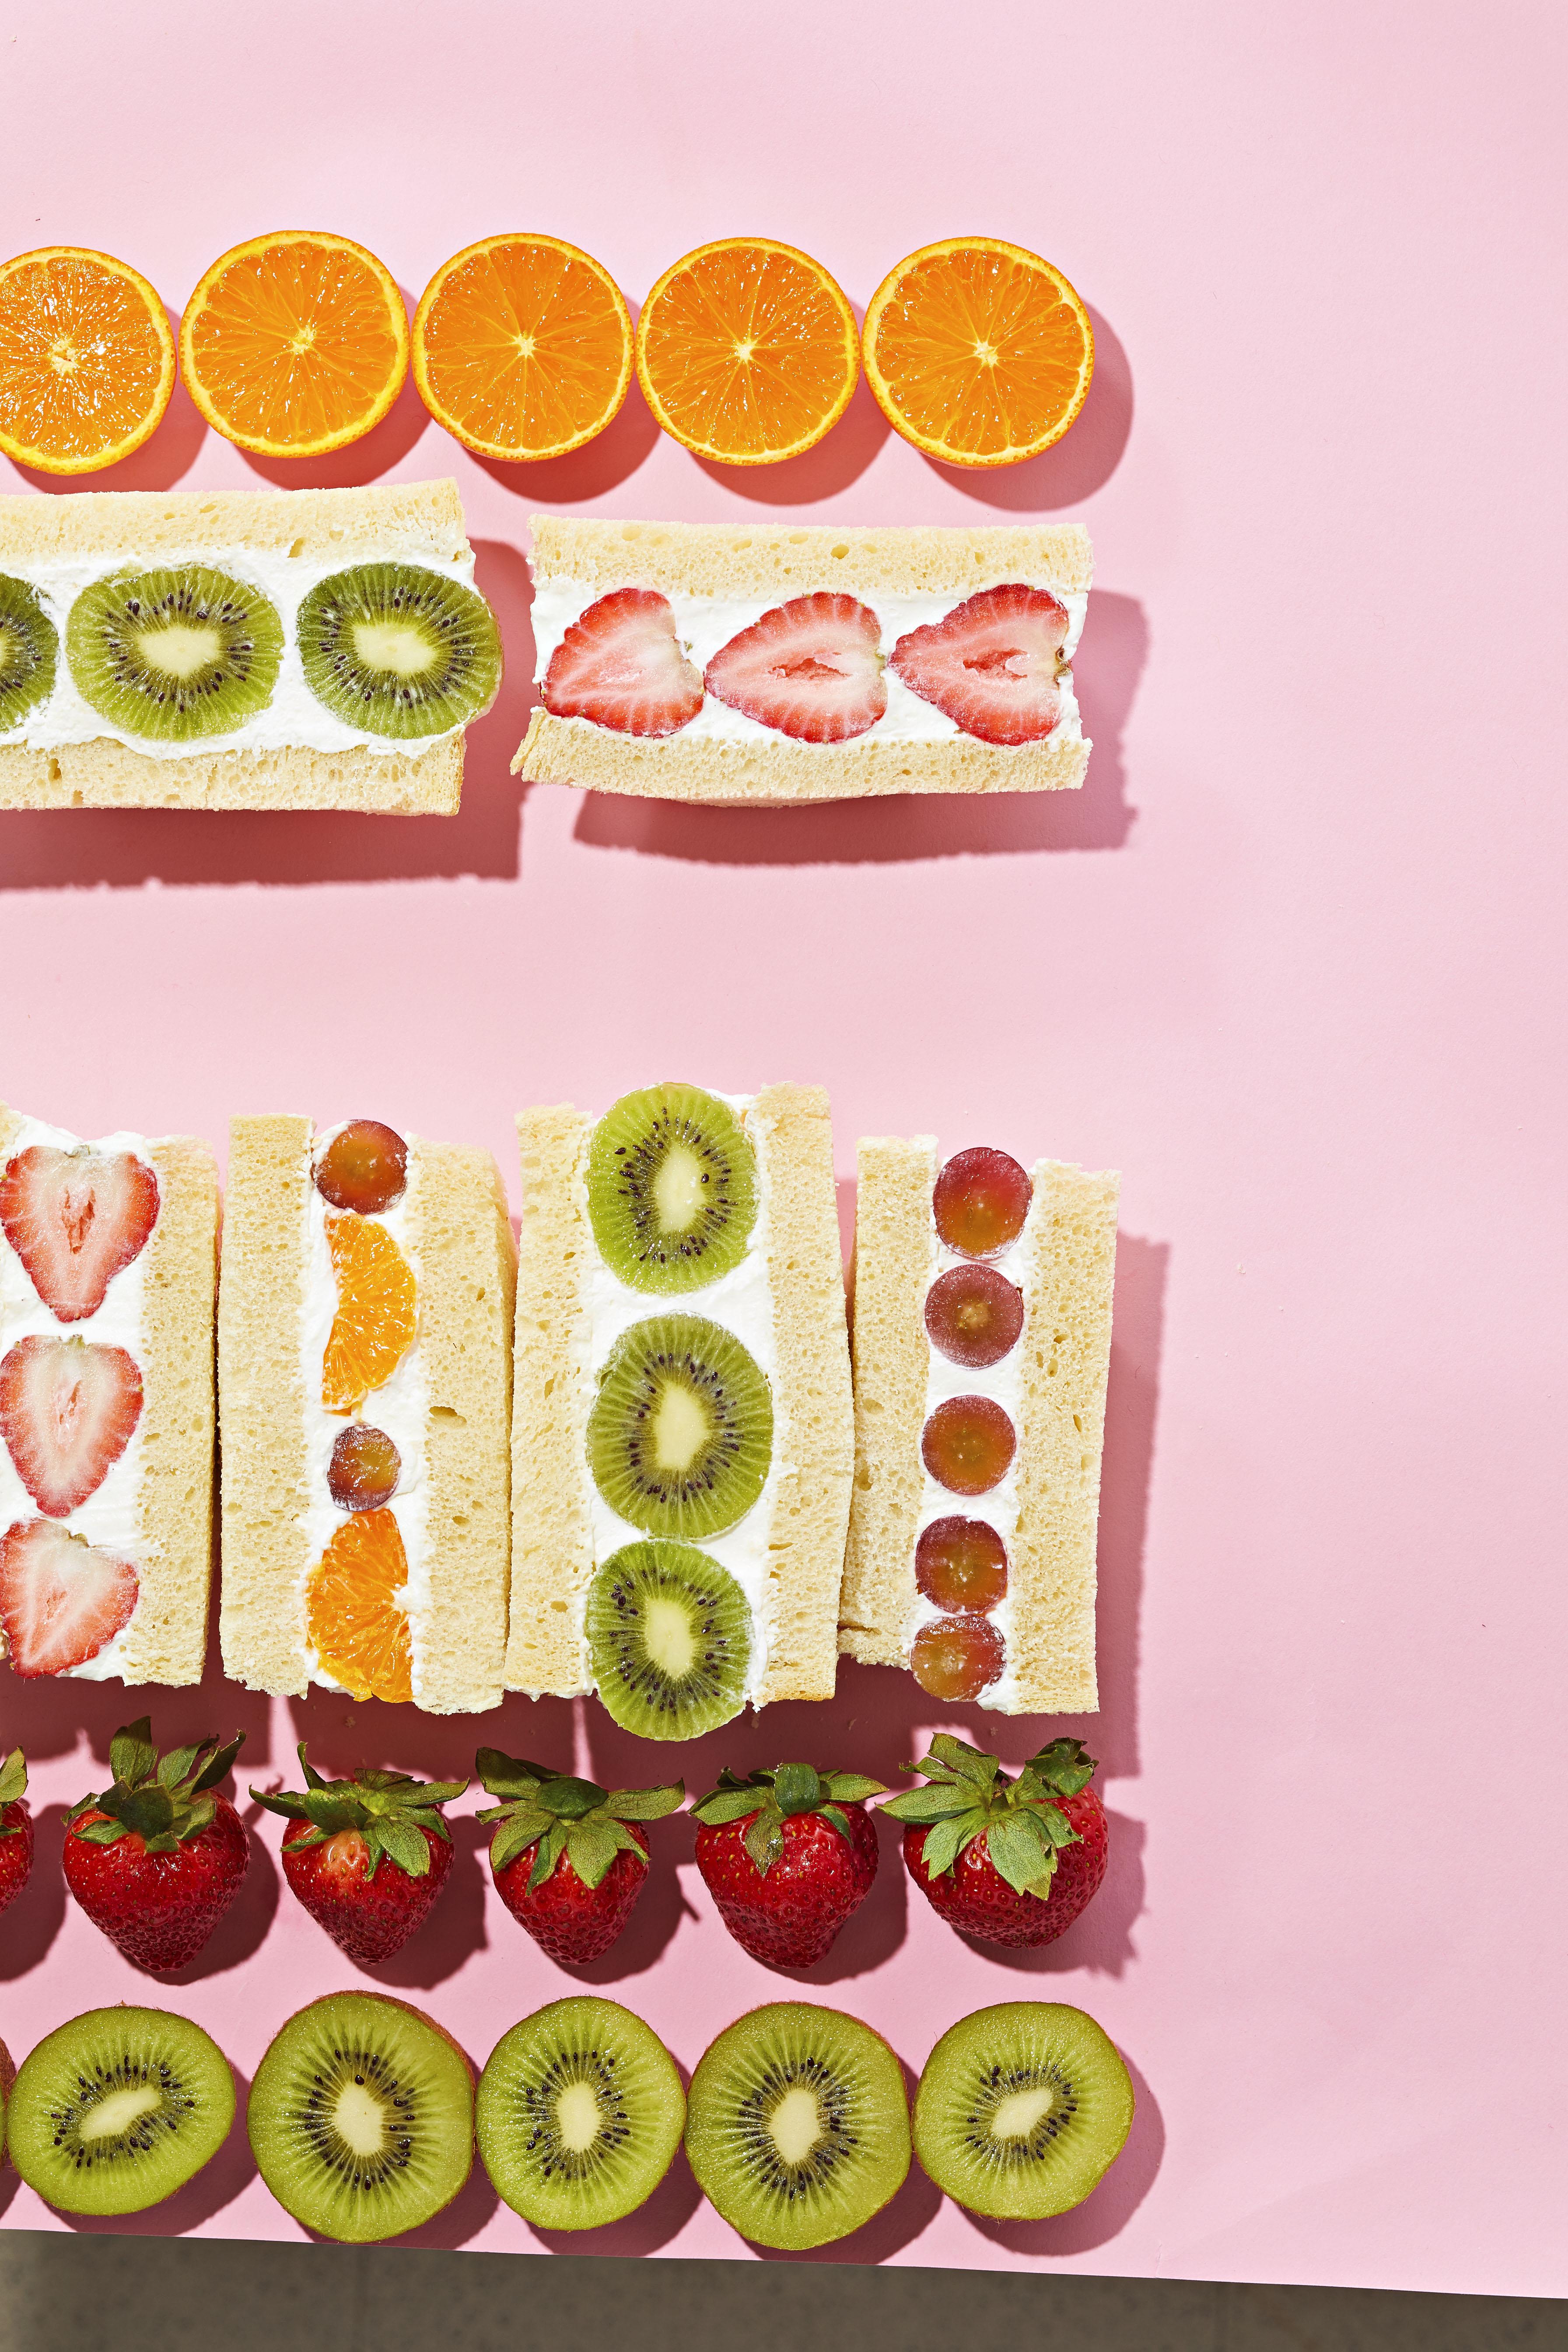 Furutsu Sando (Fruit Sandwiches)